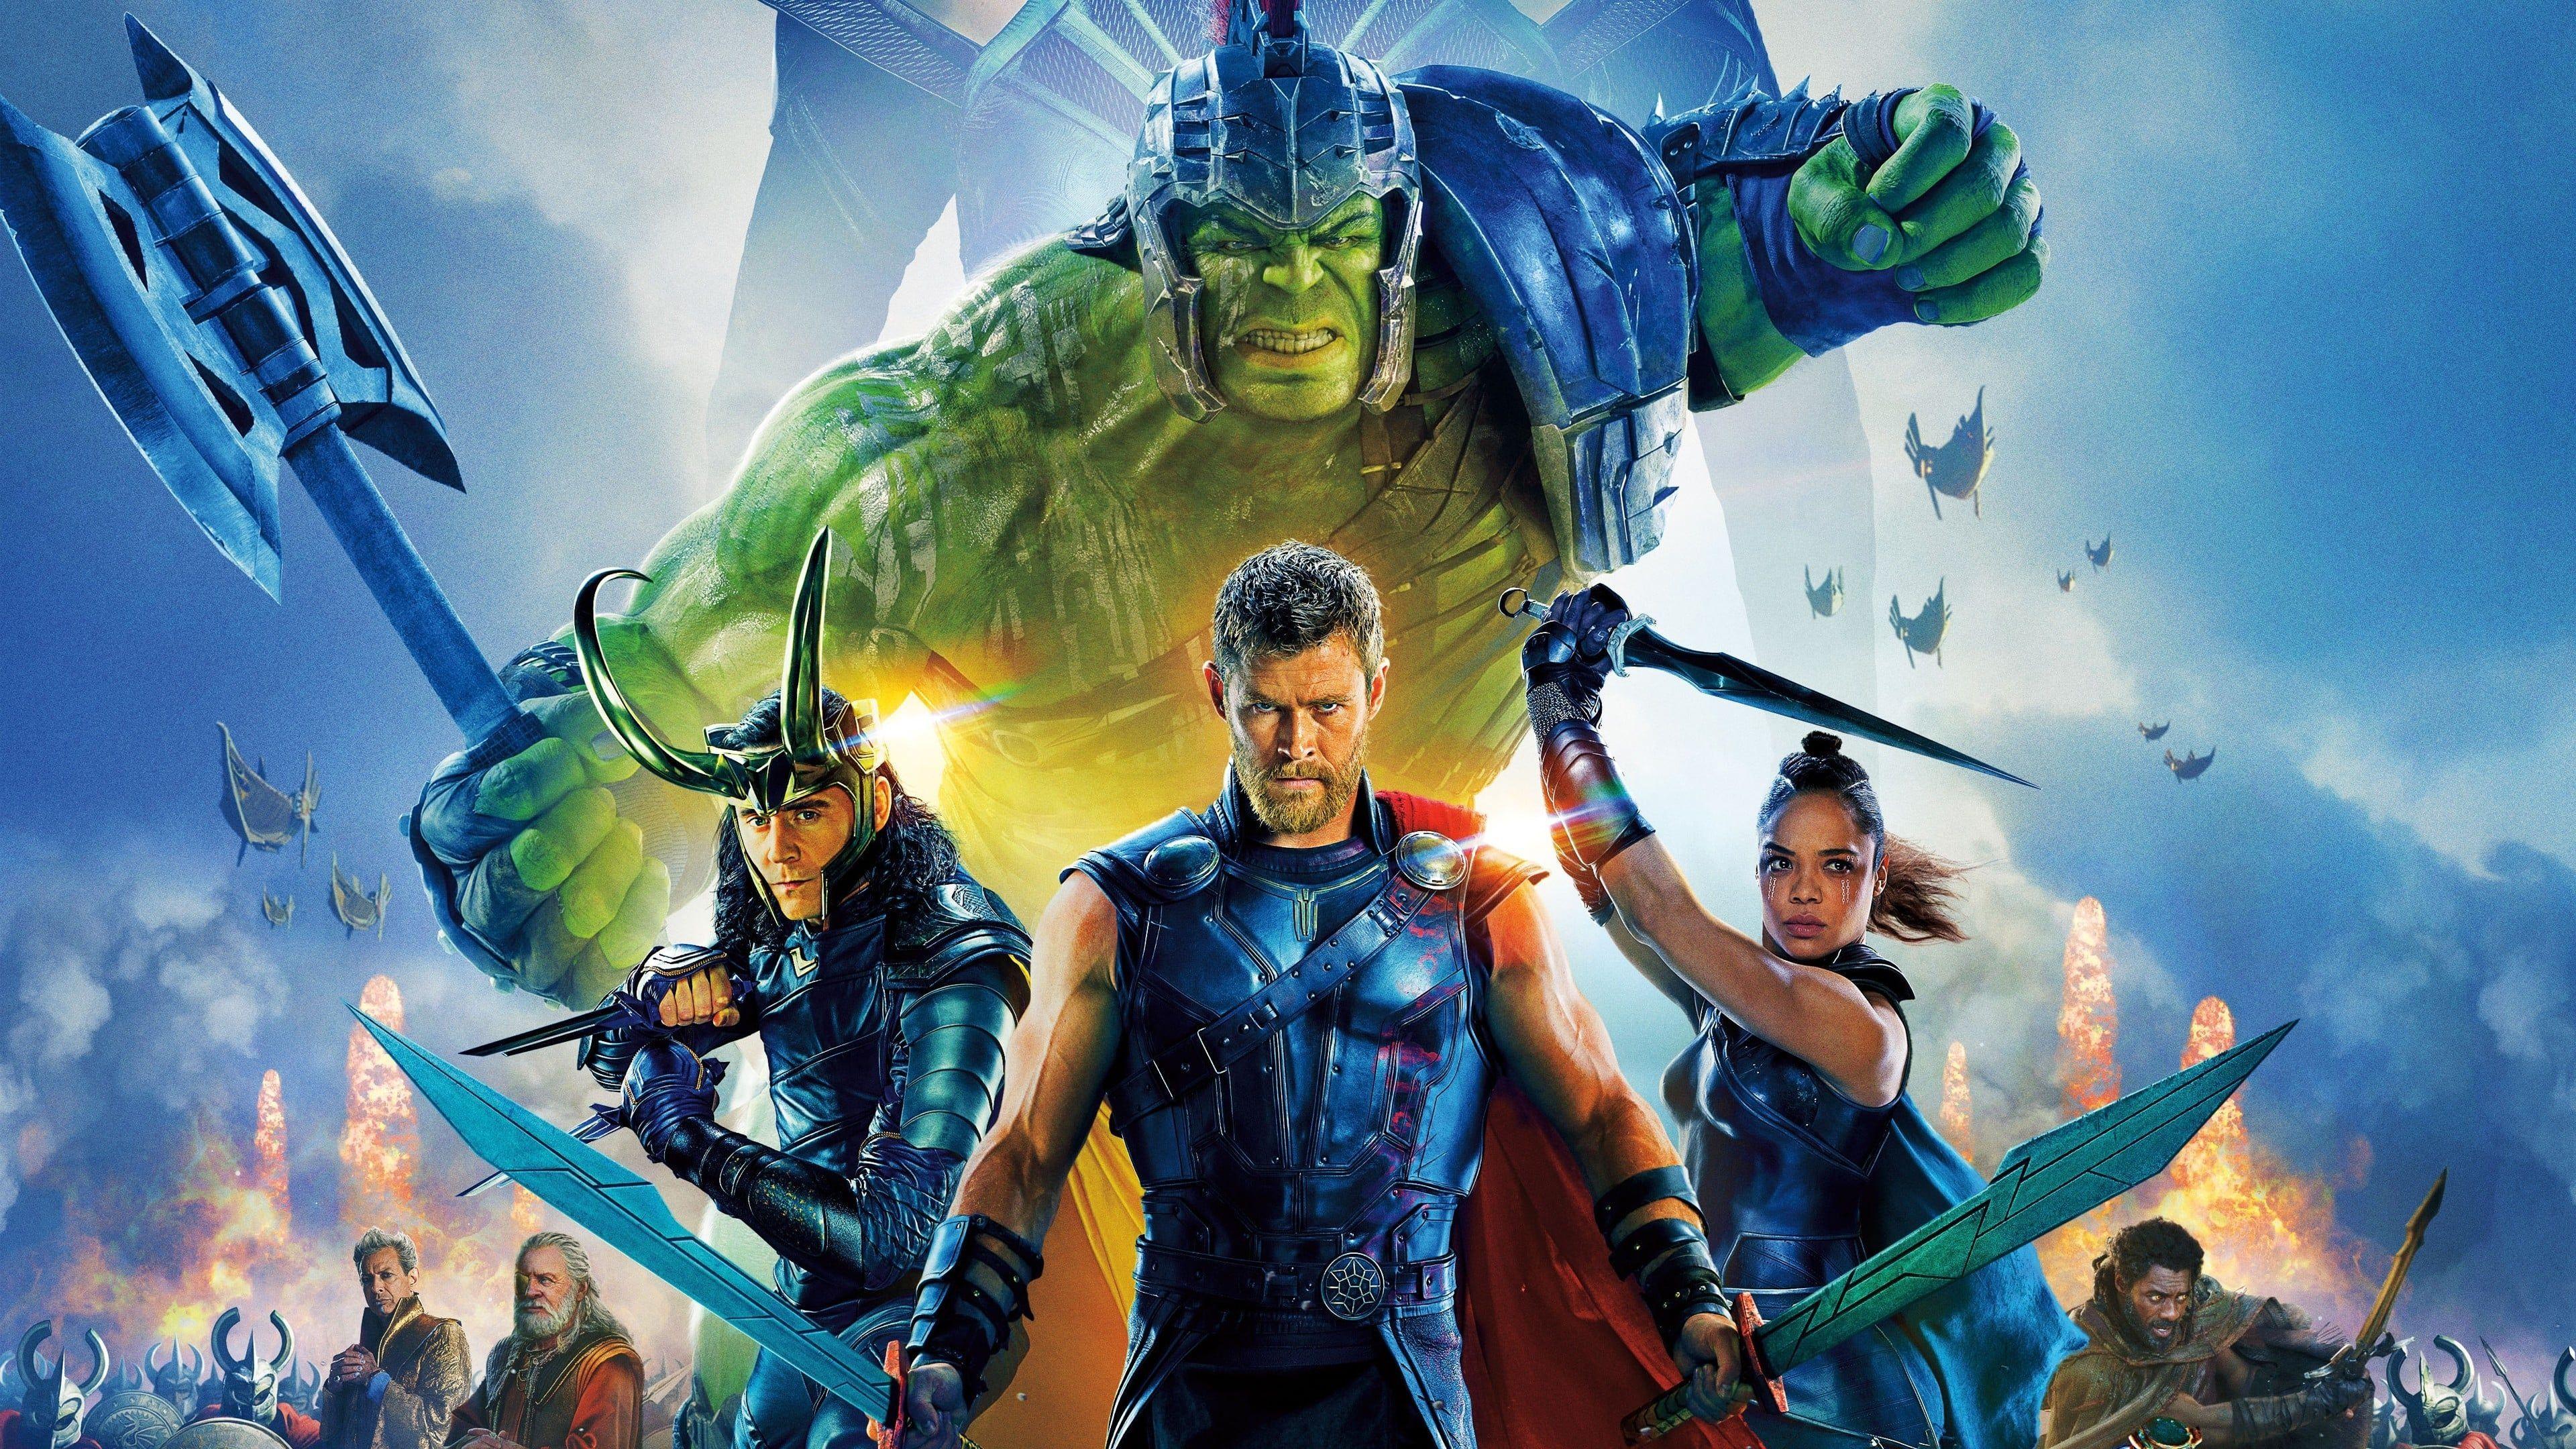 Marvel S Thor Ragnarok Is Now Available To Stream On Disney Plus Using Apple Tv Roku Fire Tv Smart Tvs And Mobi Thor Ragnarok Full Movie Thor Wallpaper Thor